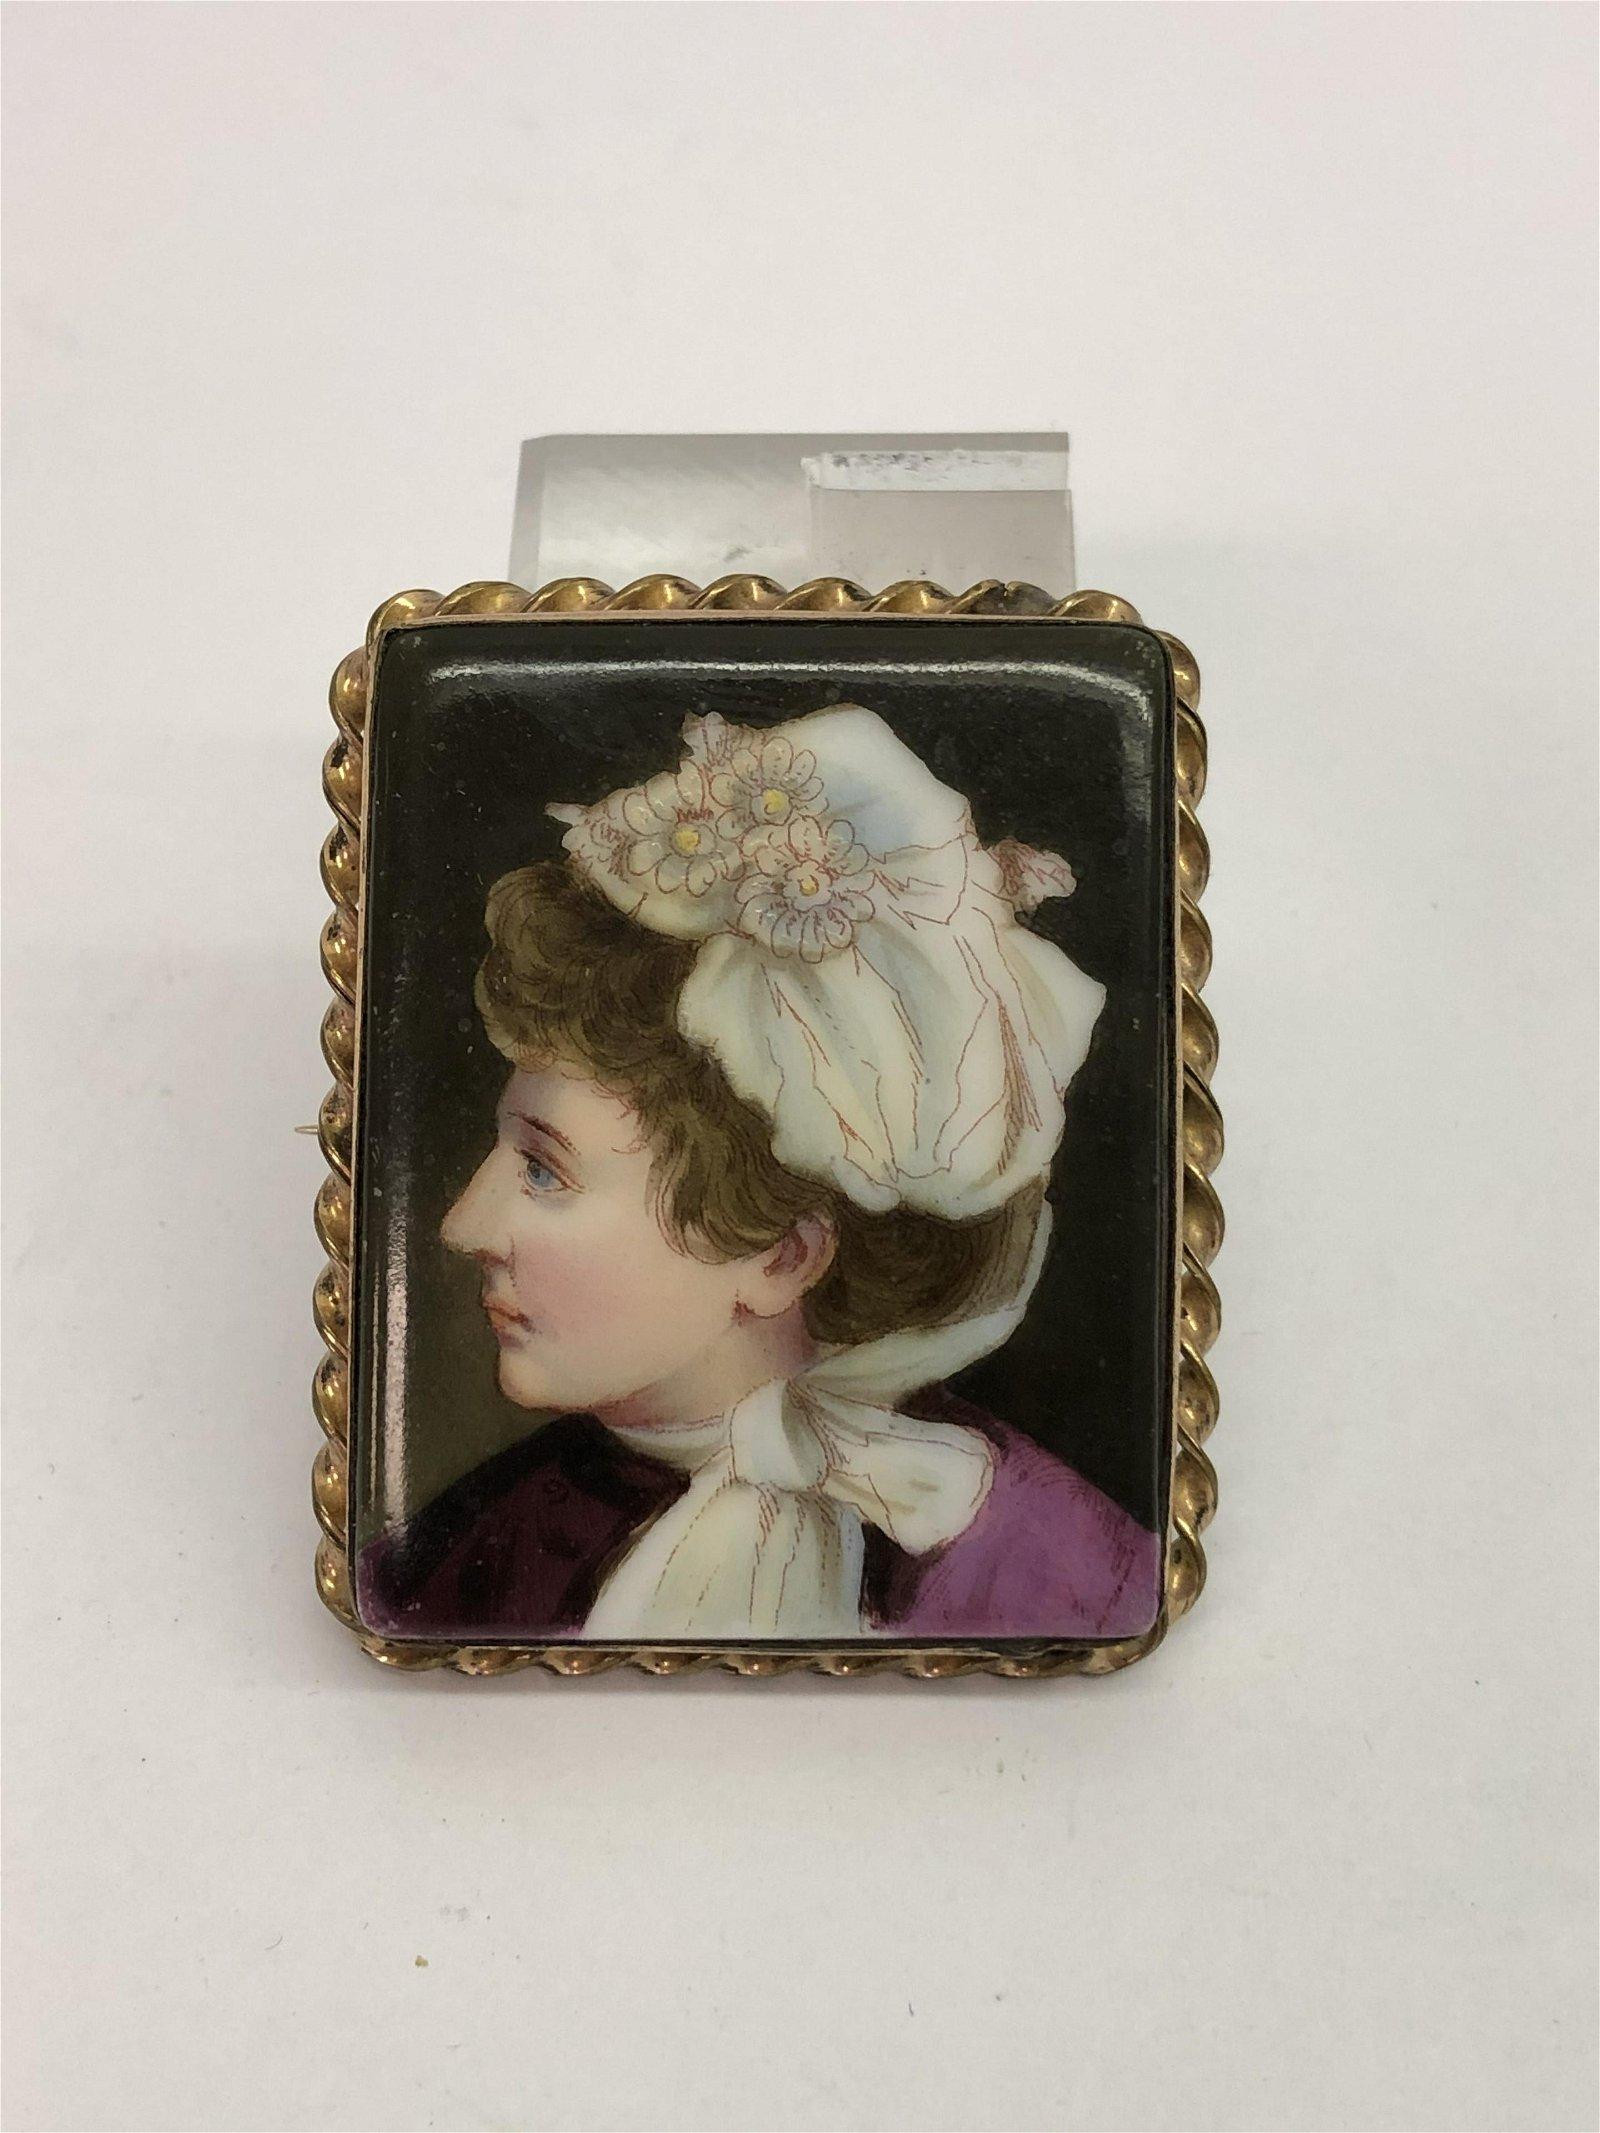 Victorian Portrait on Porcelain Brooch